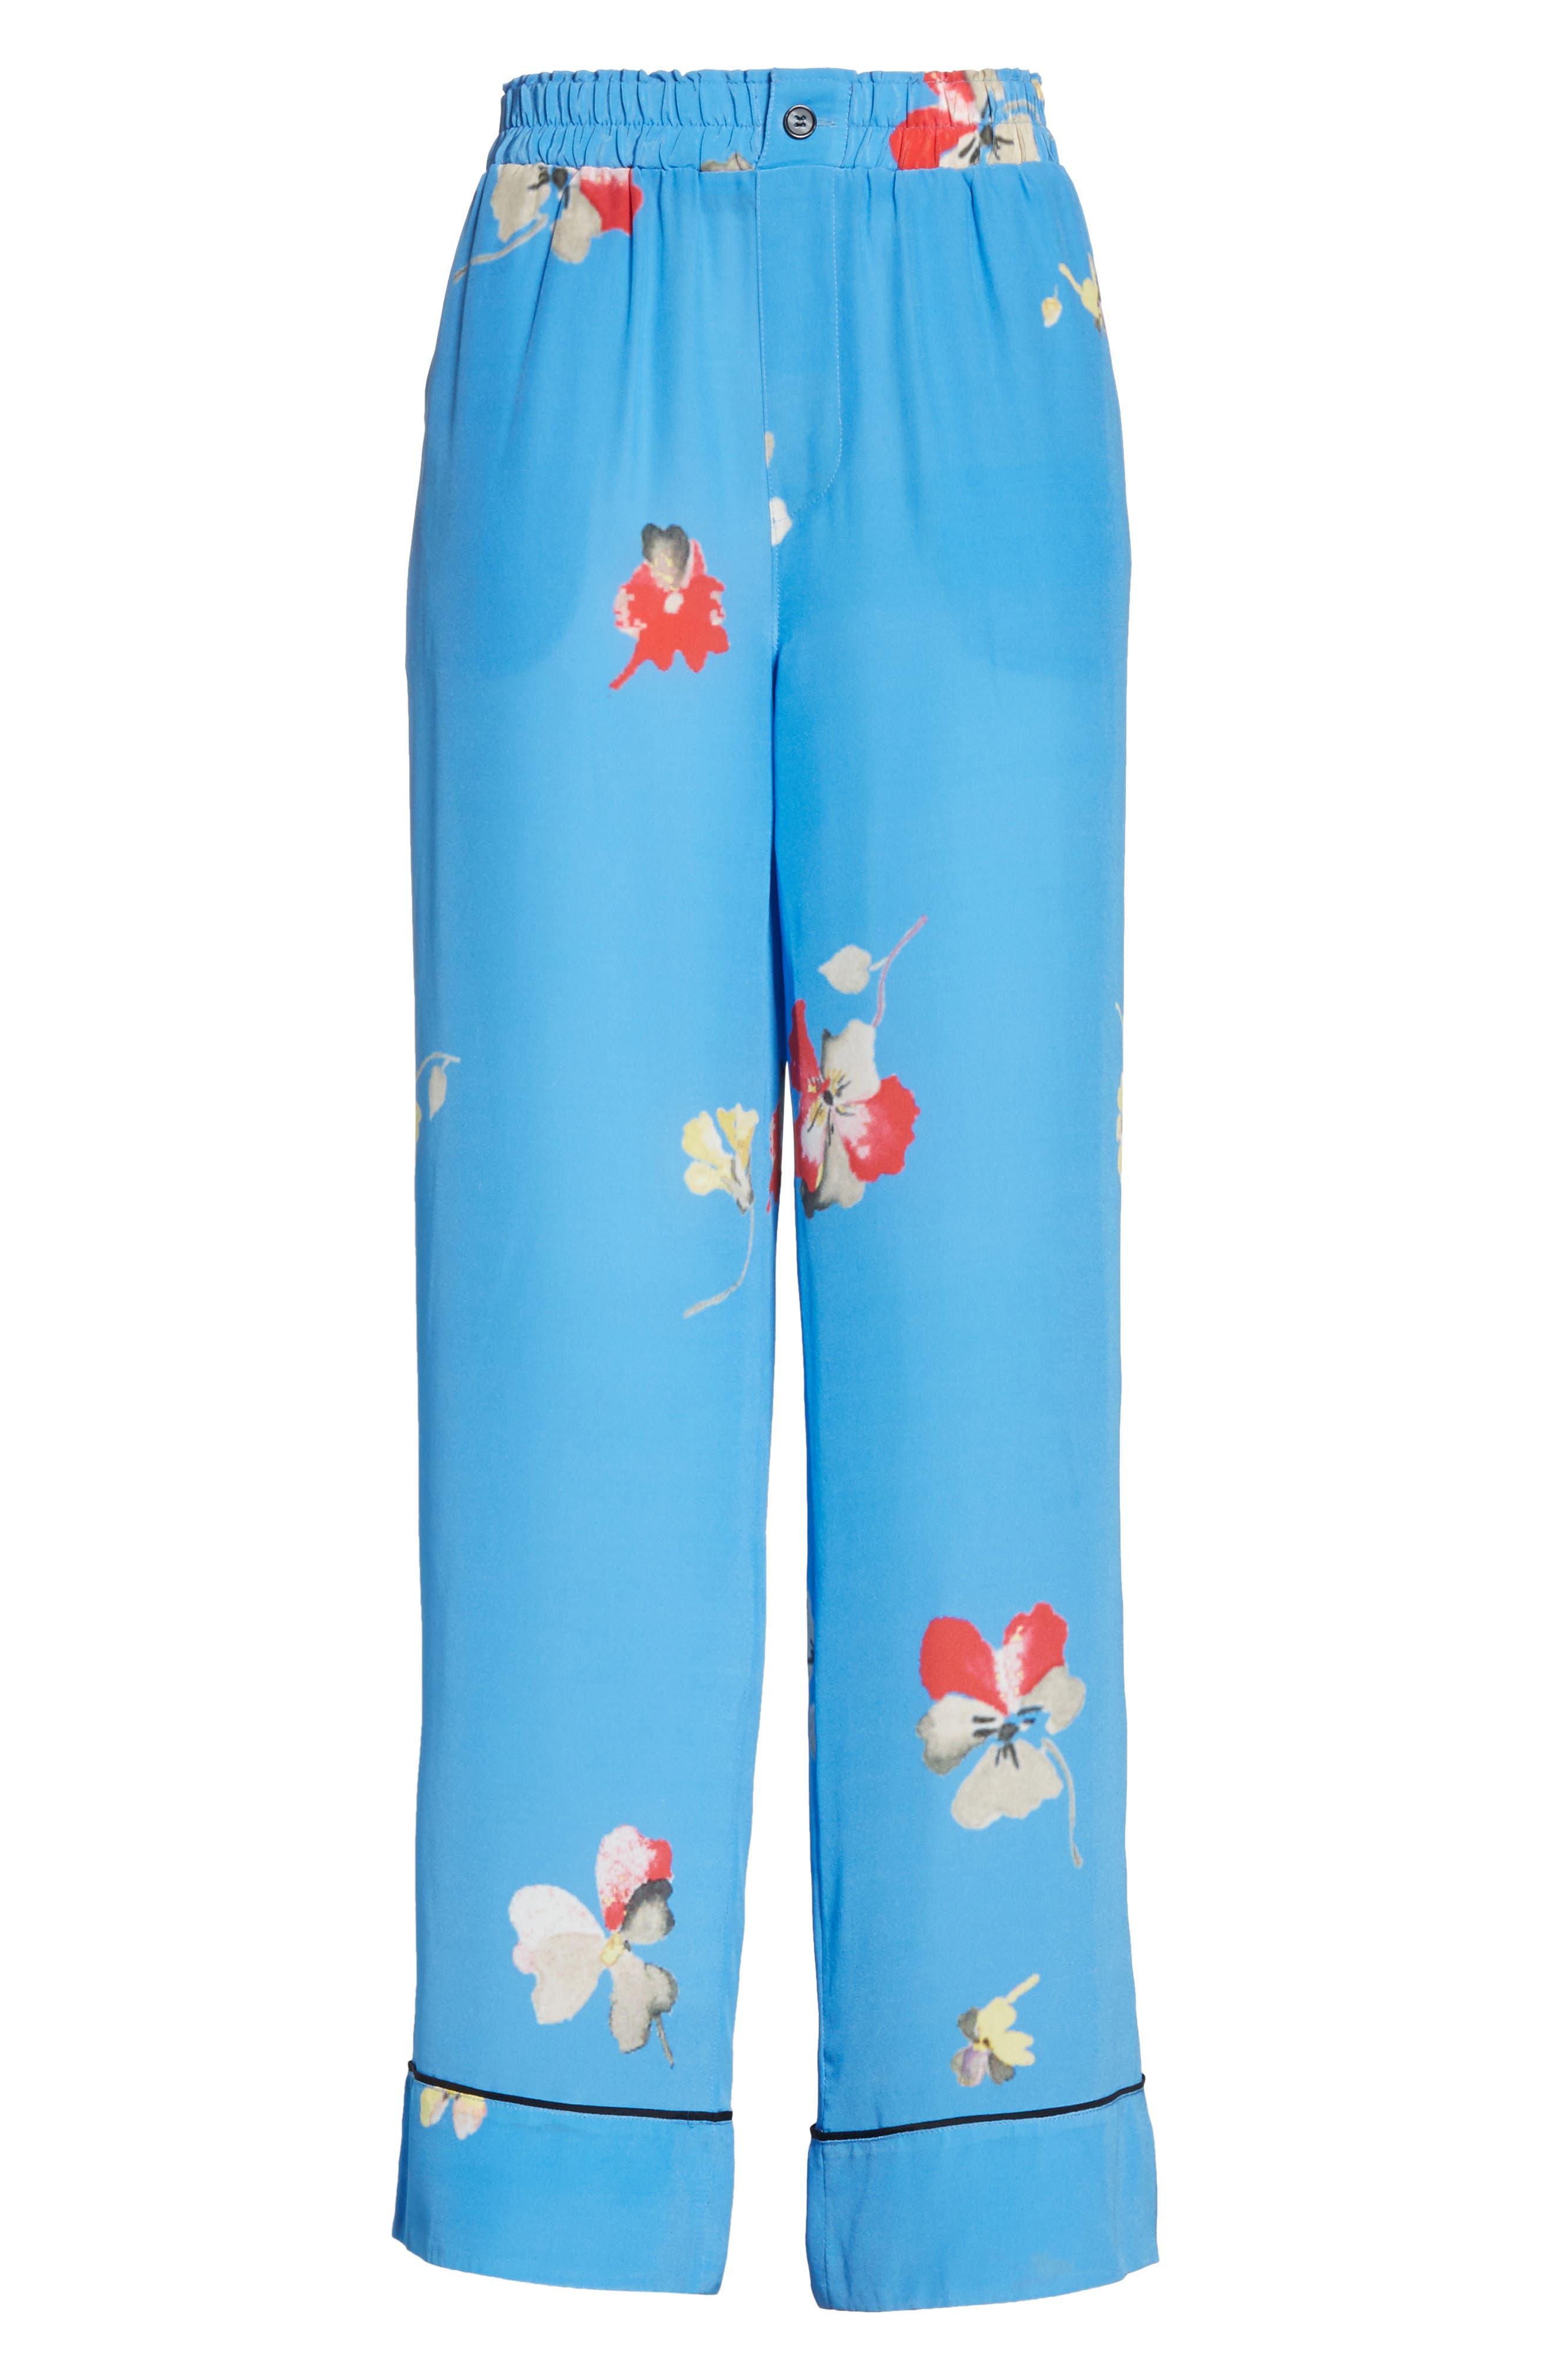 Joycedale Floral Silk Lounge Pants,                             Alternate thumbnail 6, color,                             400